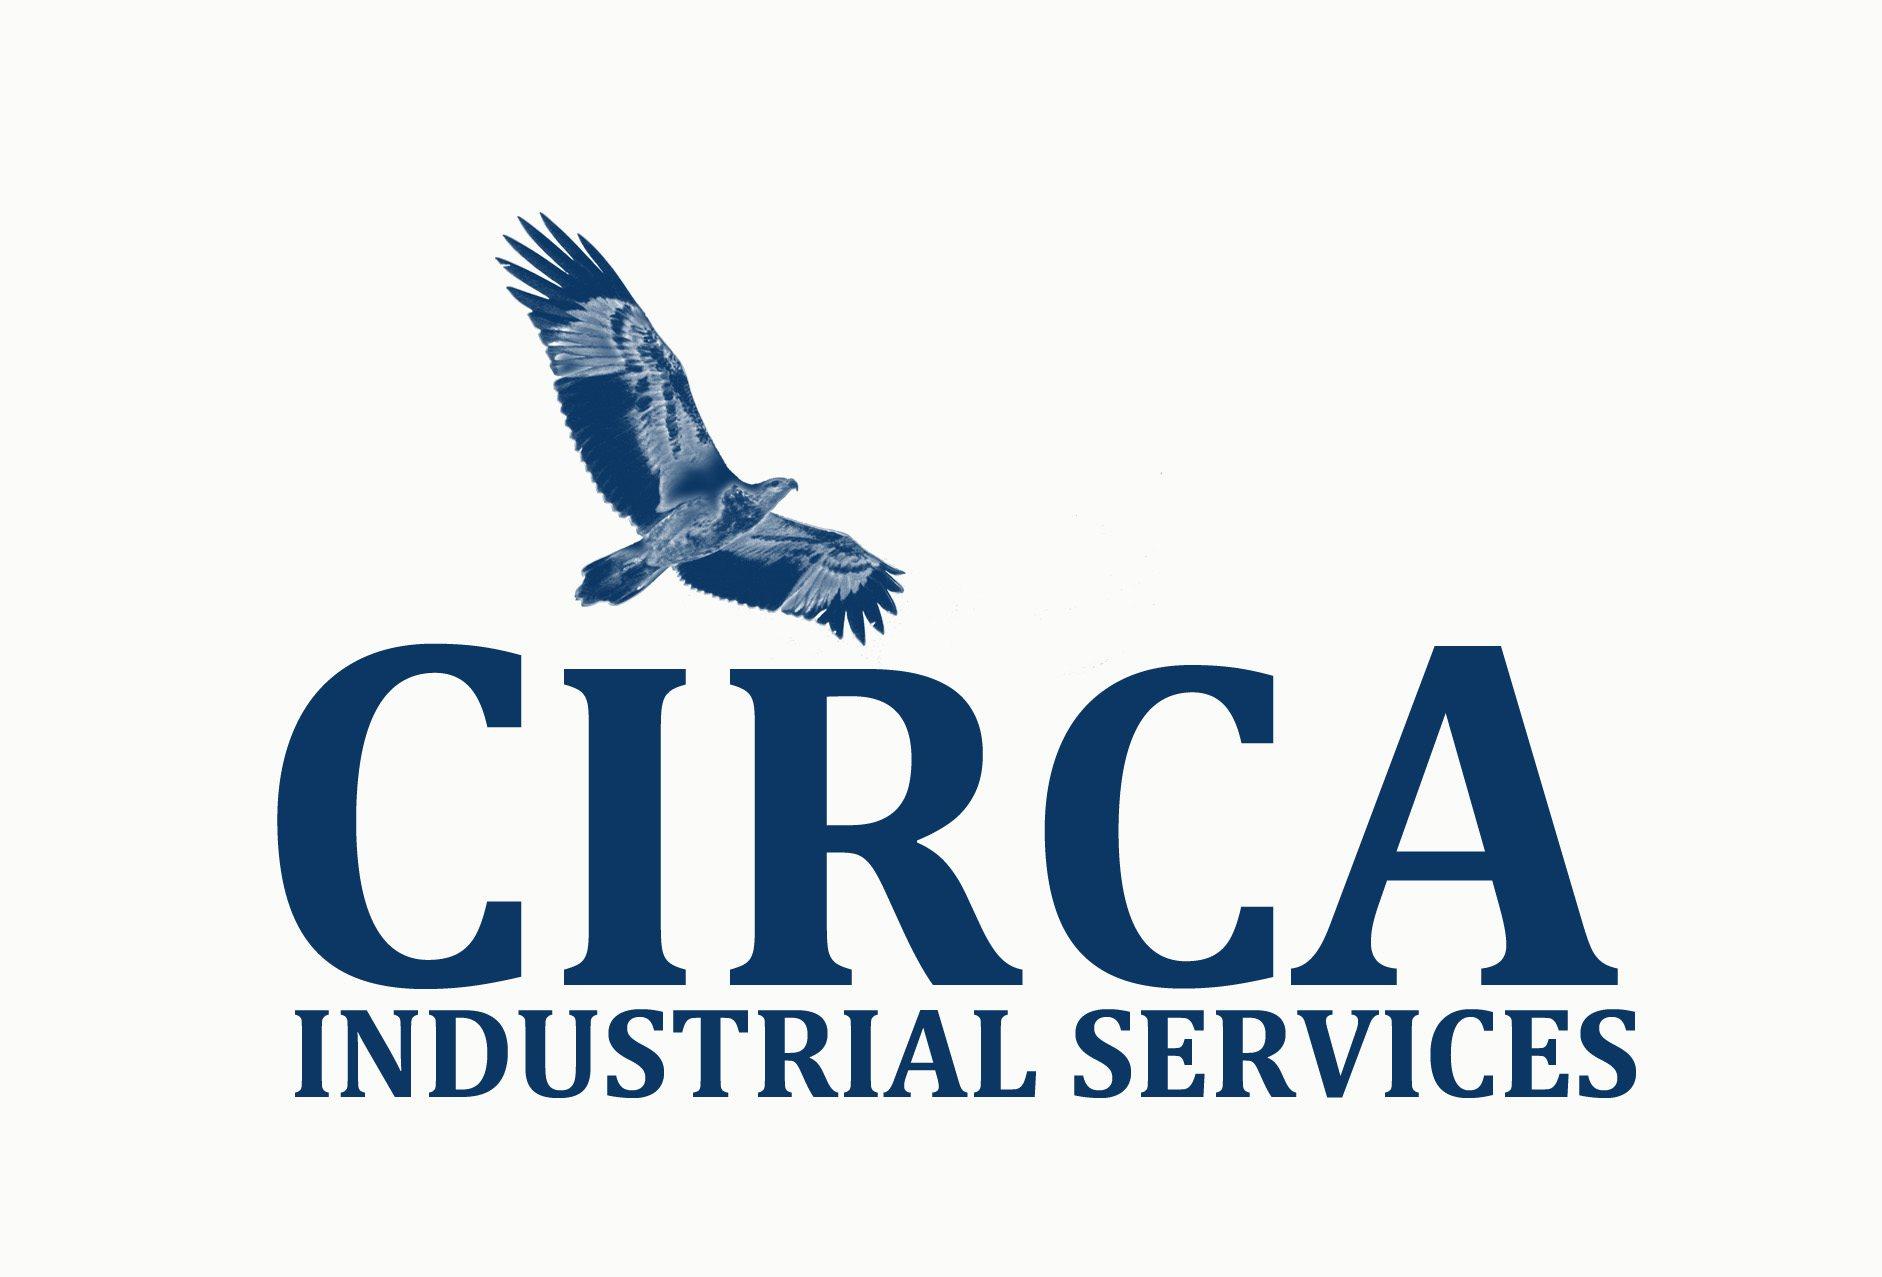 Circa Industrial Services